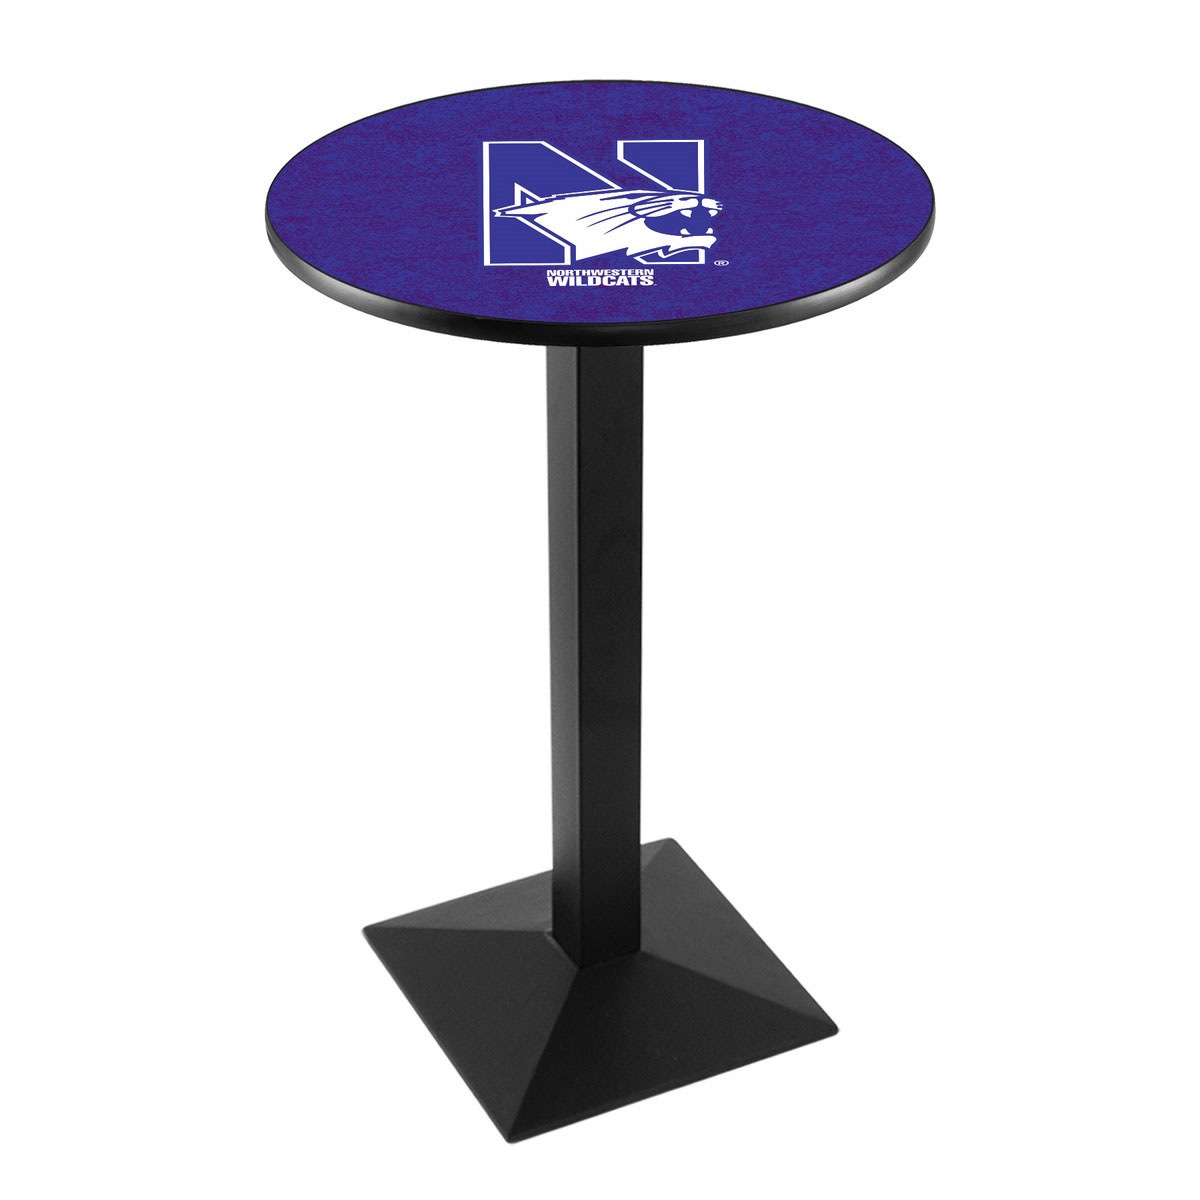 Popular Northwestern University Logo Pub Bar Table Square Stand Product Photo